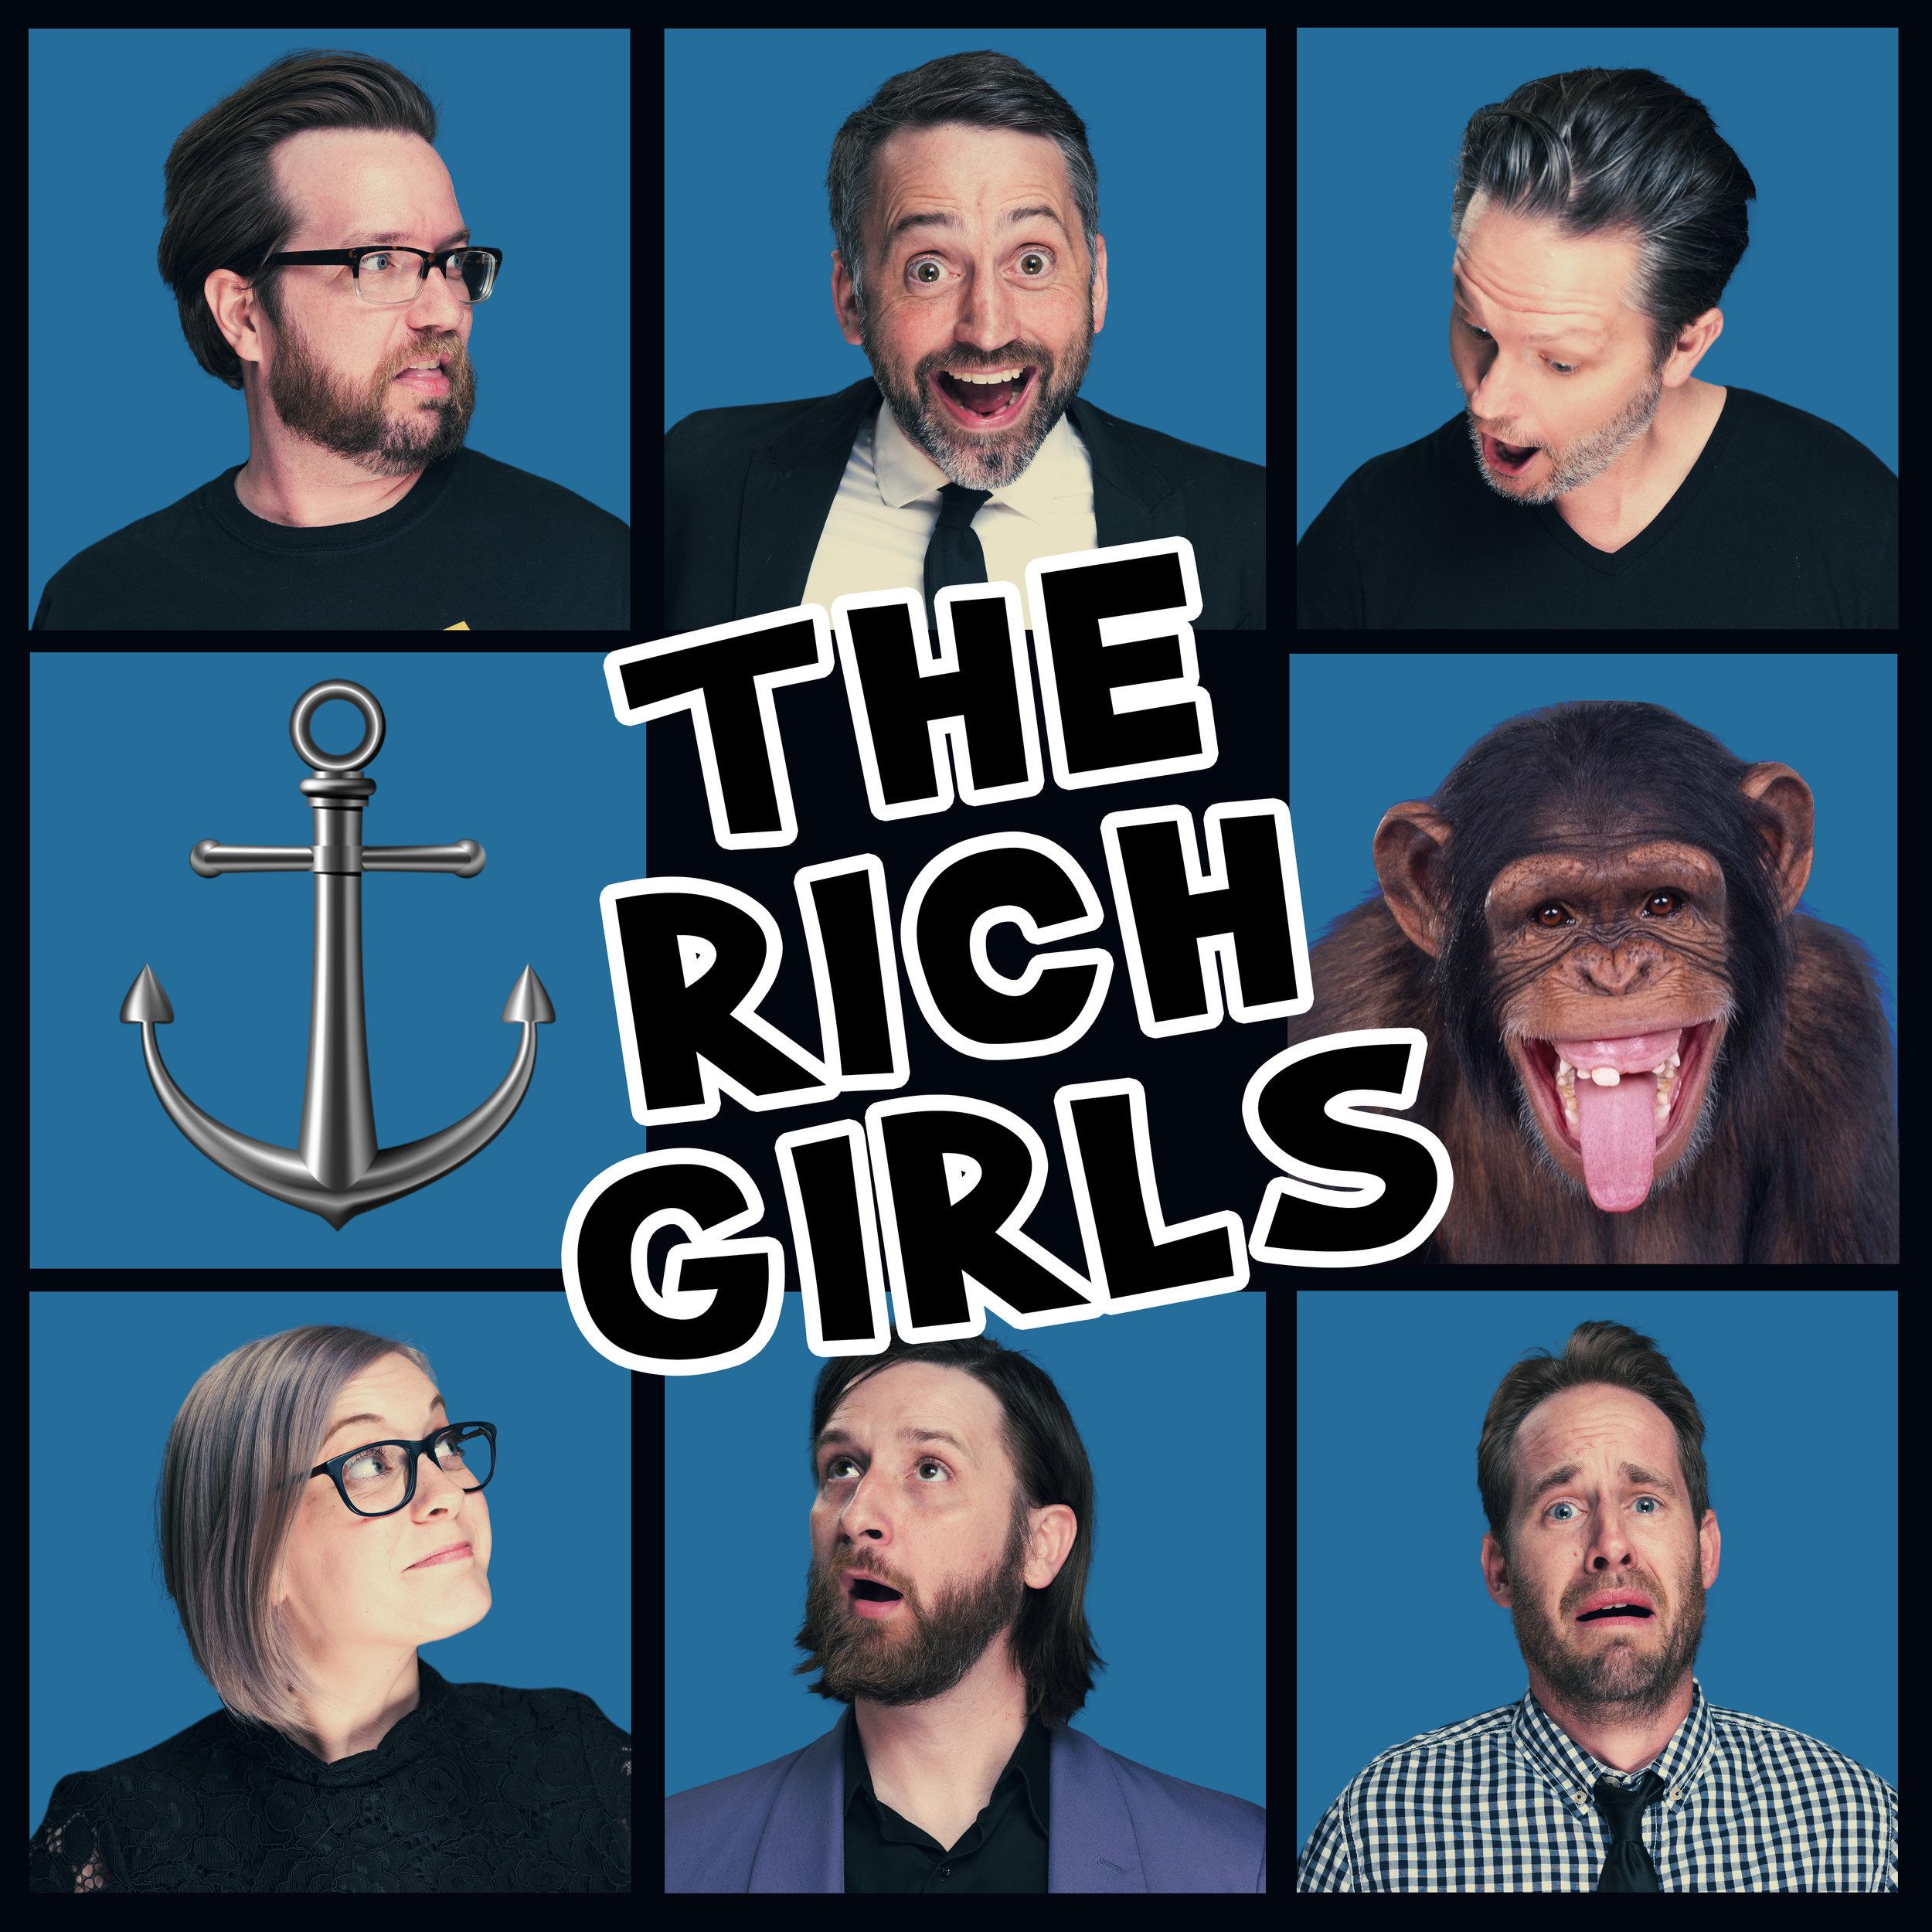 richgirls-bradywithfont2.jpg